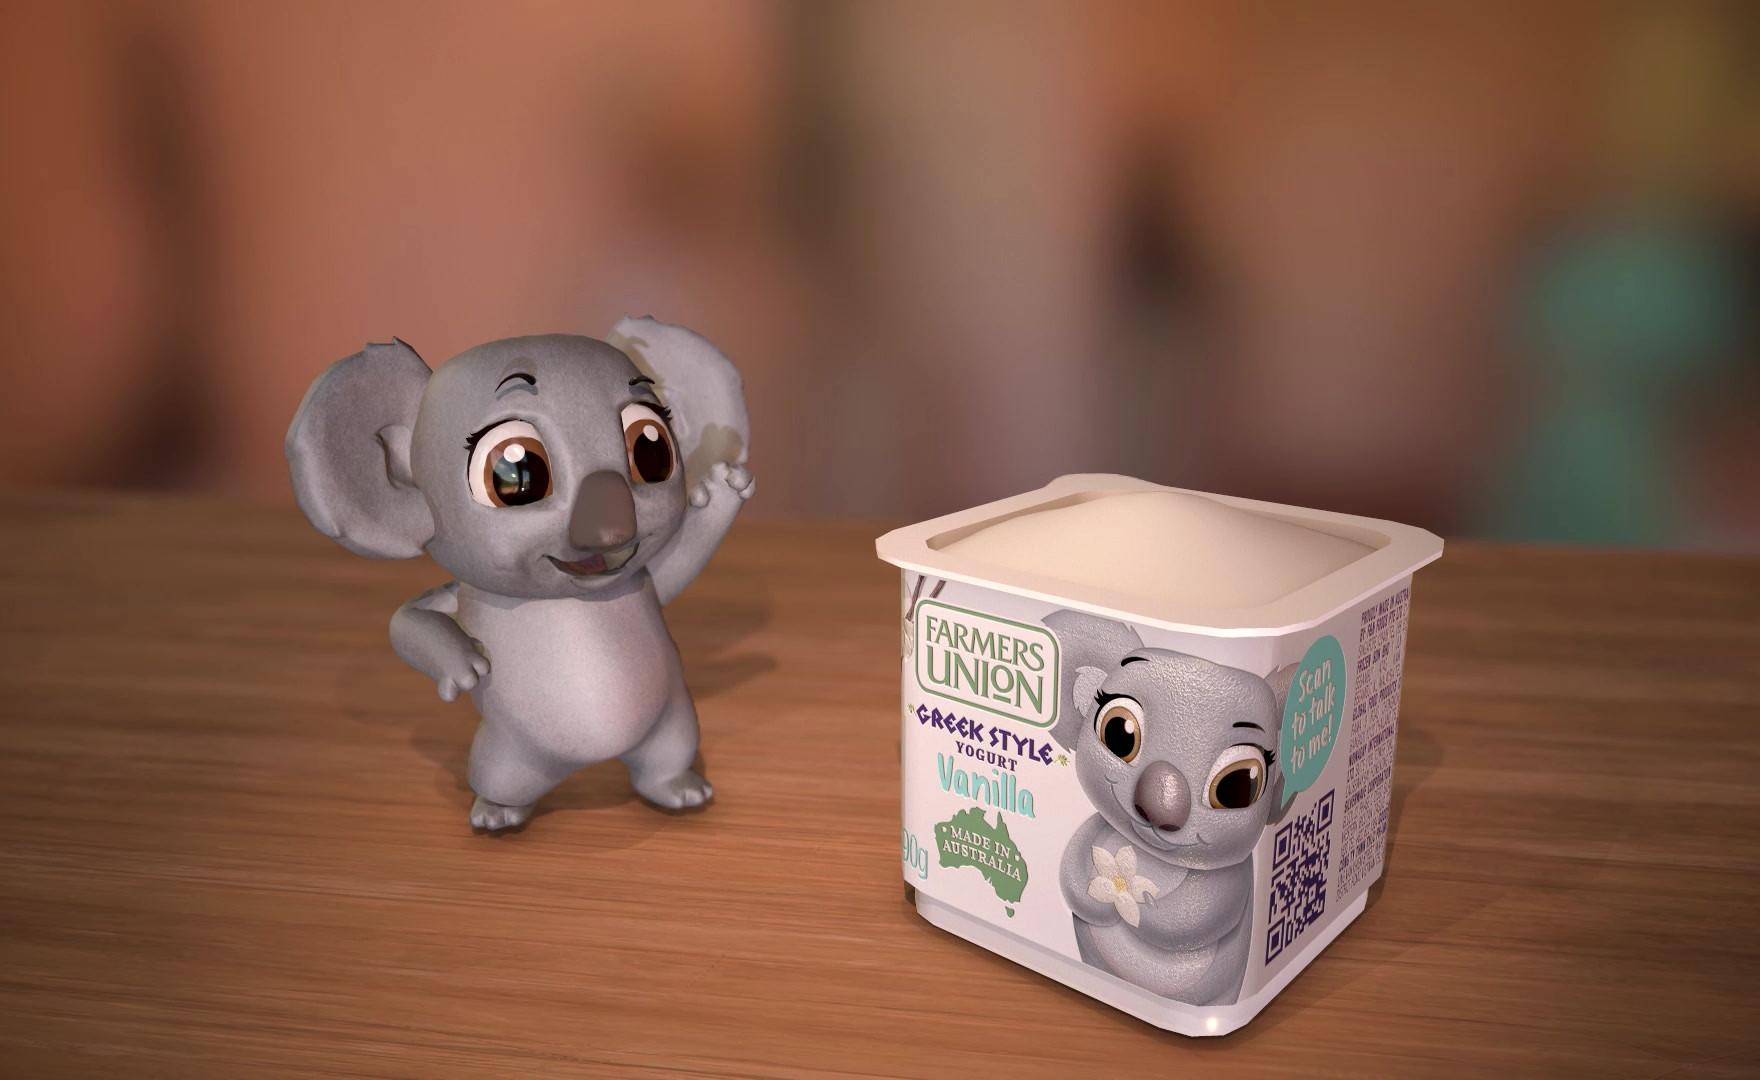 Koala_Delivery_HD_1080p.mp4